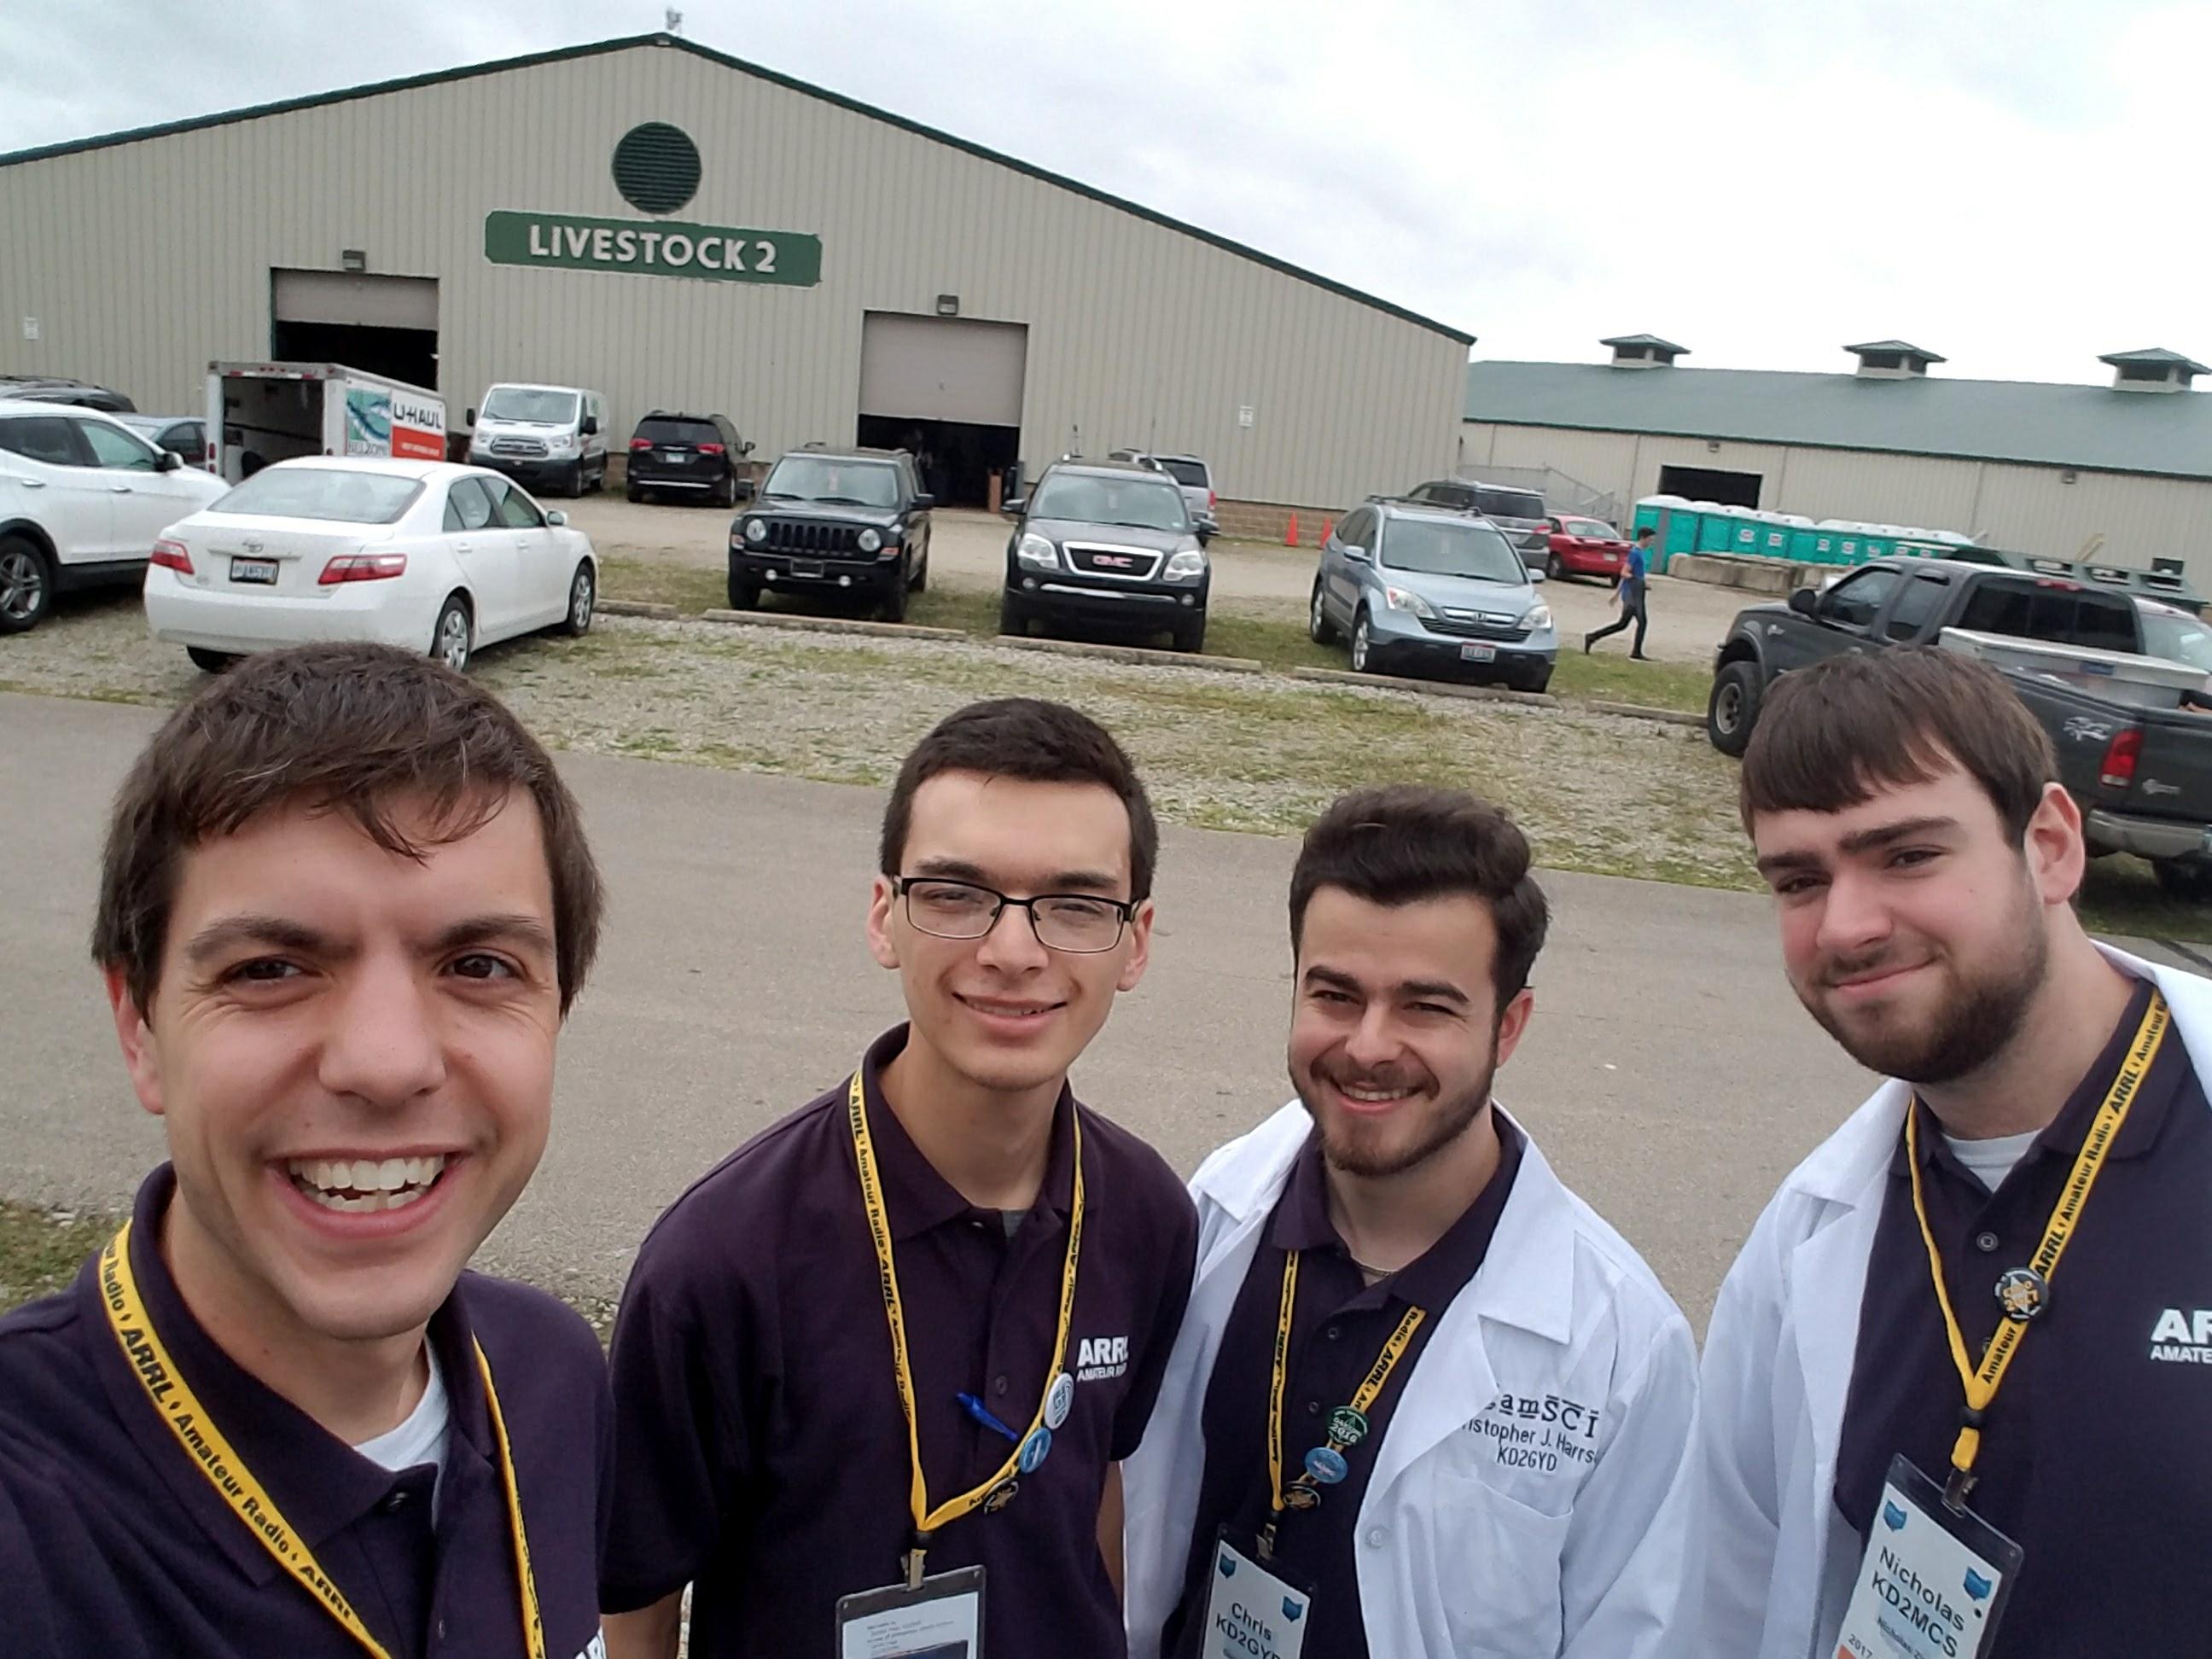 Nathaniel Frissell W2NAF, Josh Vega KD2NKK, Chris Harrsch KD2GYD, and Nick Zito KD2MCS